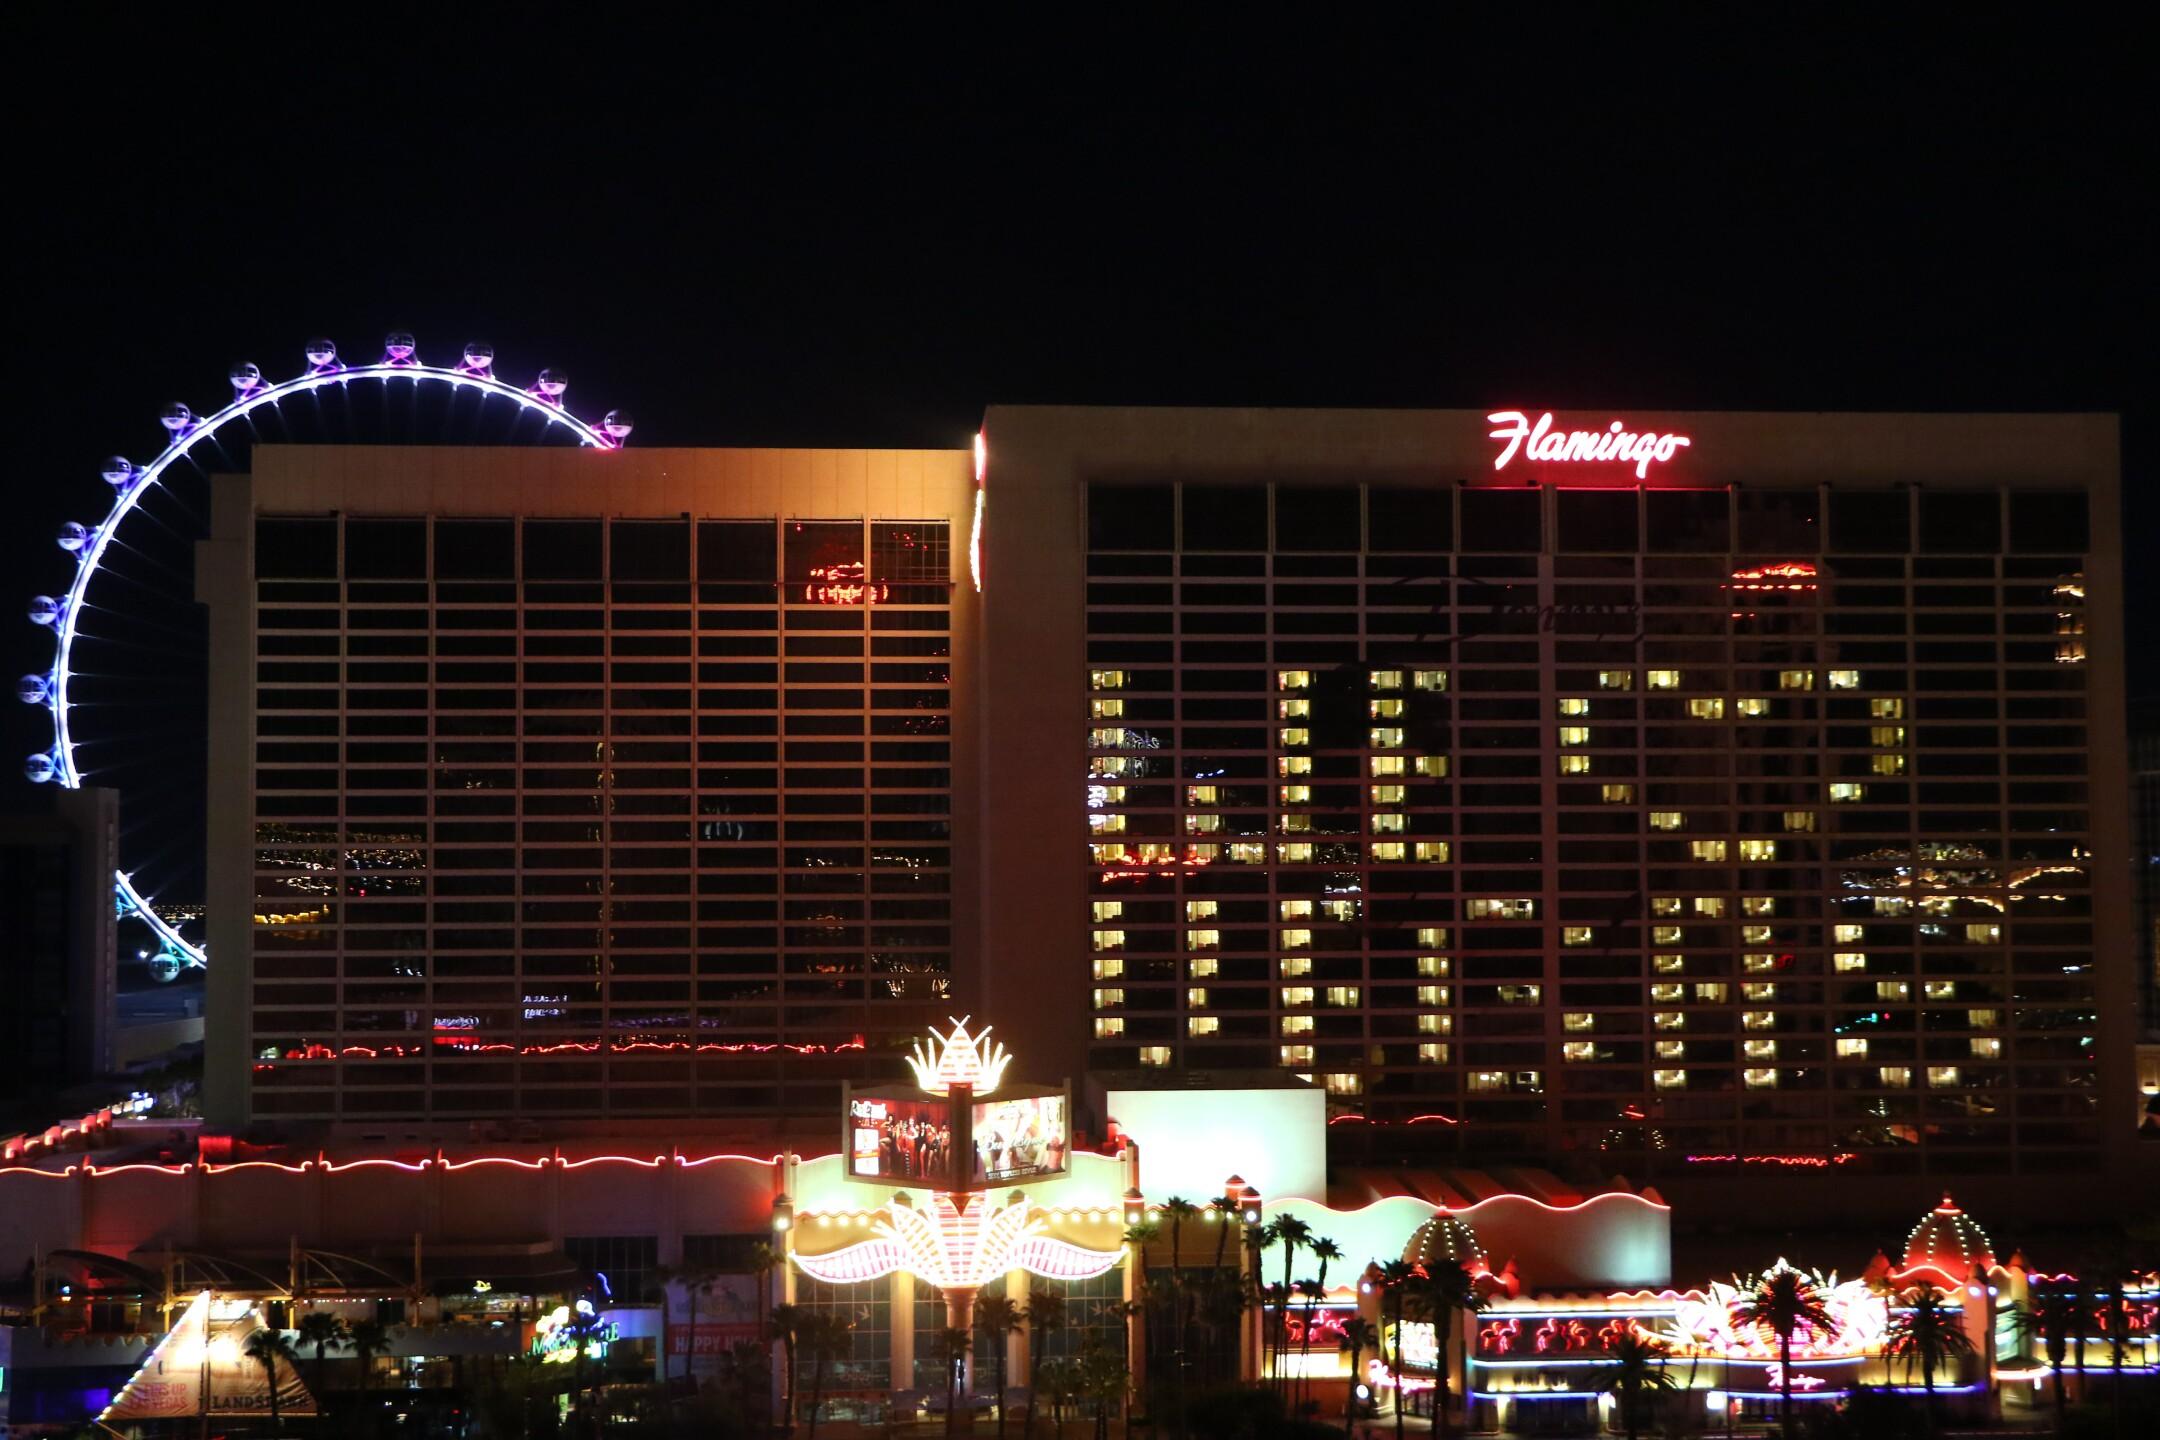 Flamingo Las Vegas_High Roller_Light Display.jpg